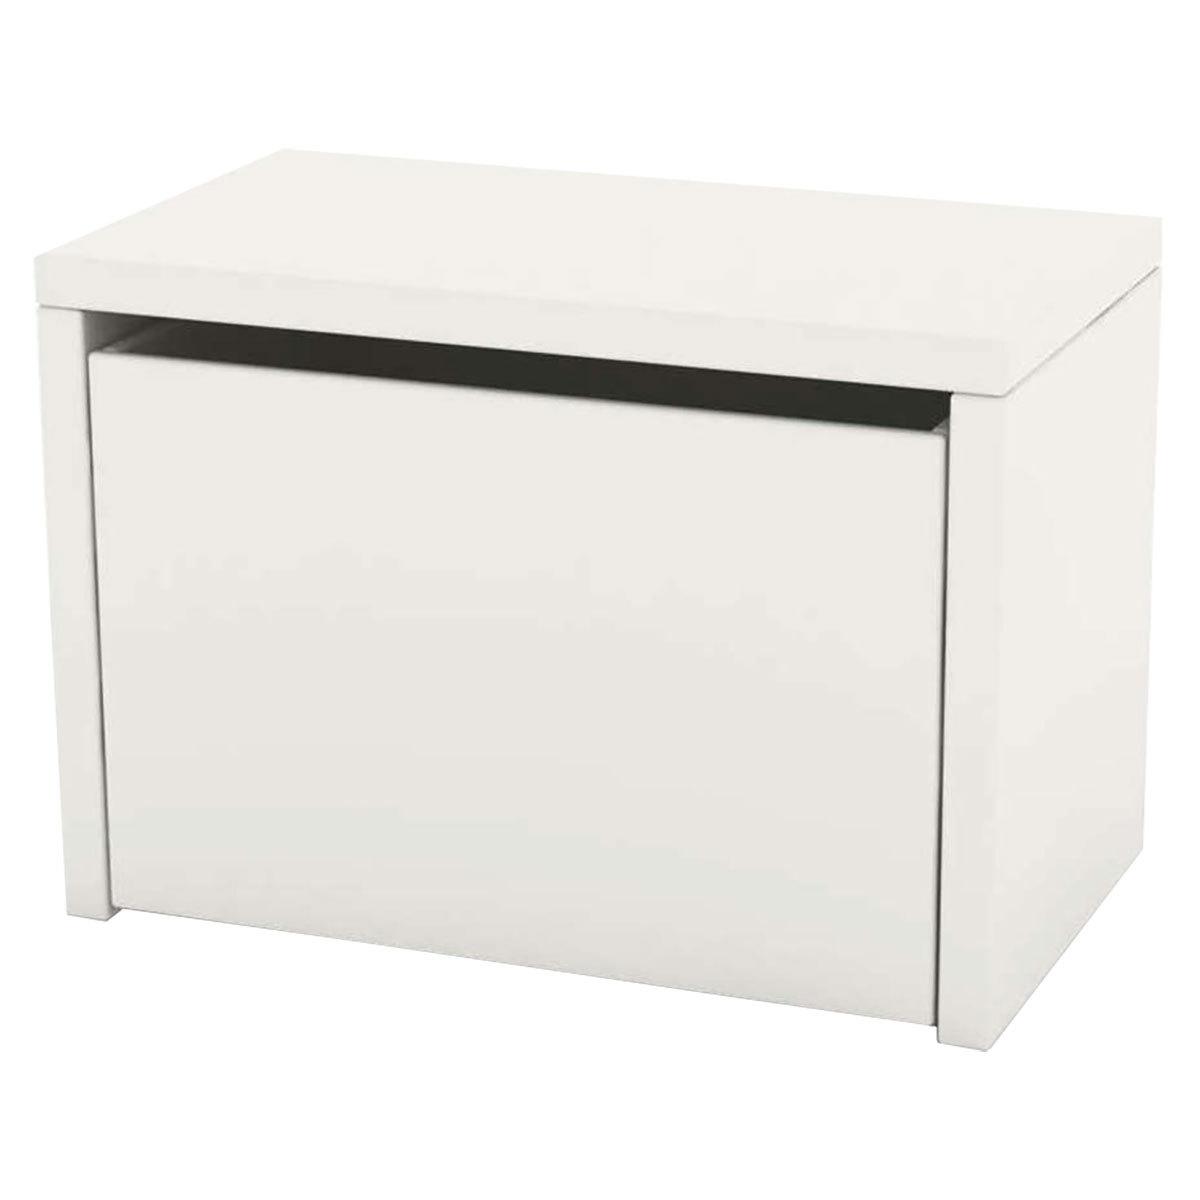 Rangement jouet Coffre de Rangement PLAY - Blanc Coffre de Rangement PLAY - Blanc